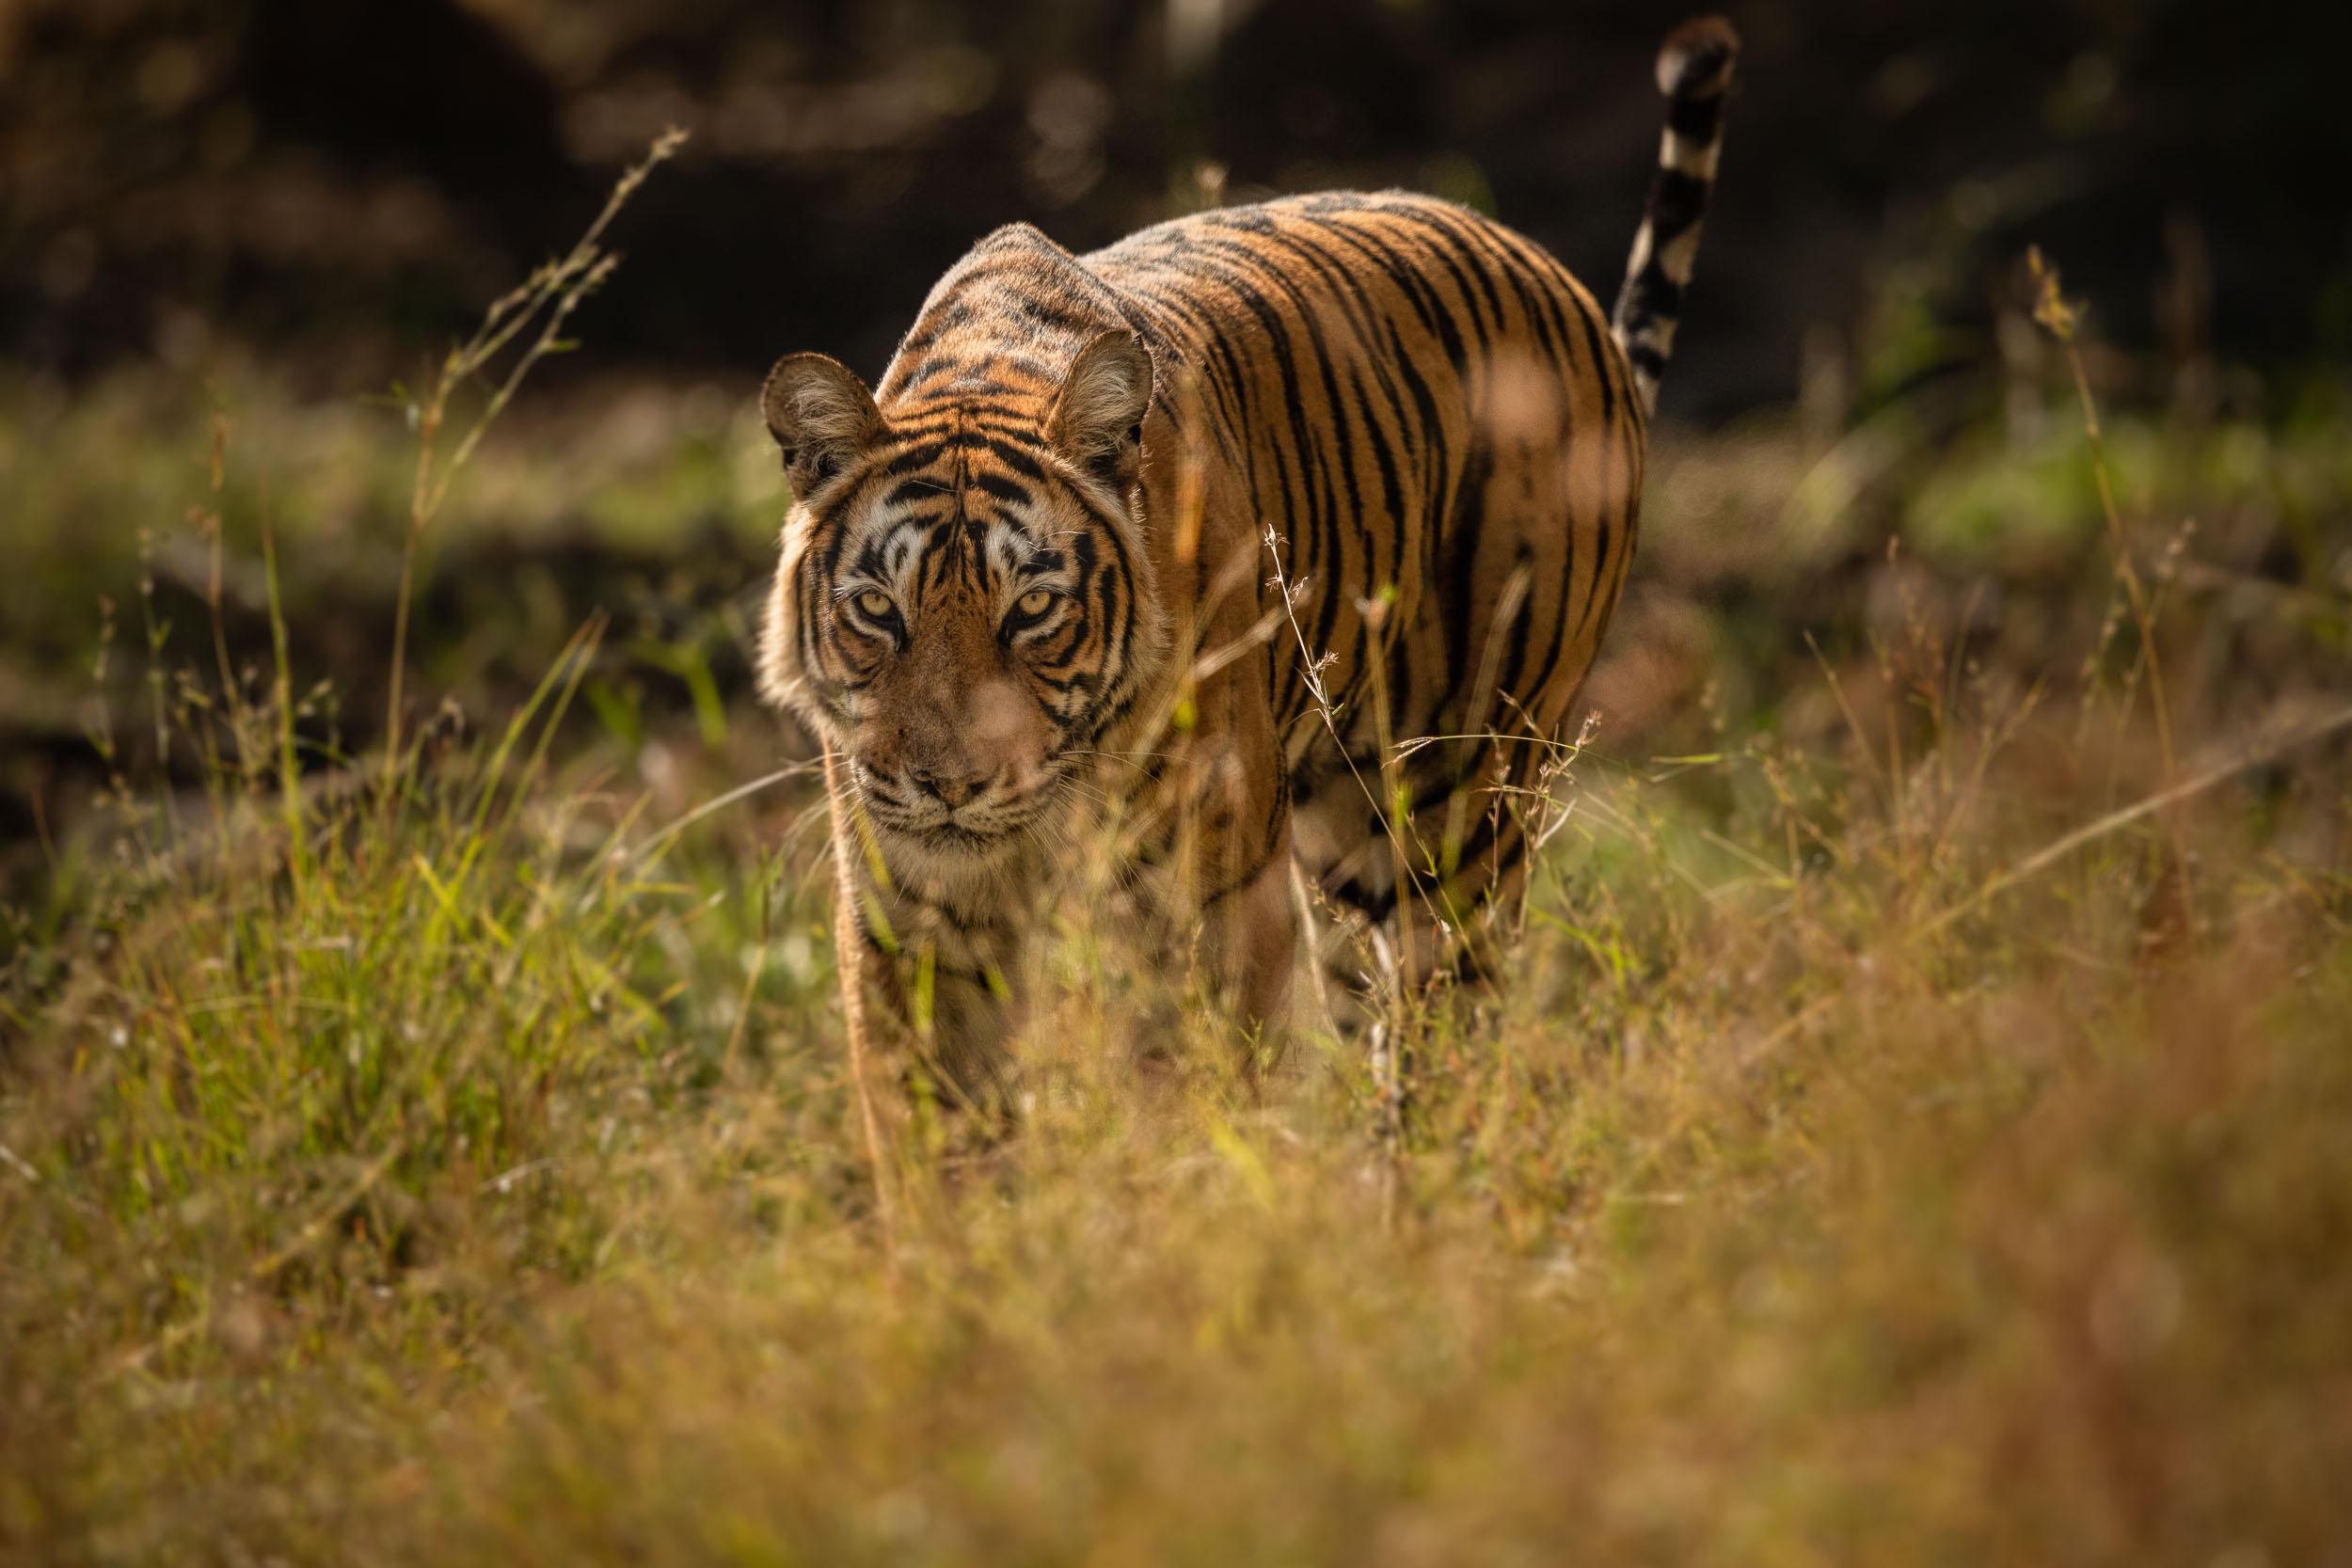 yorkshire_wildlife_photographer-2.jpg